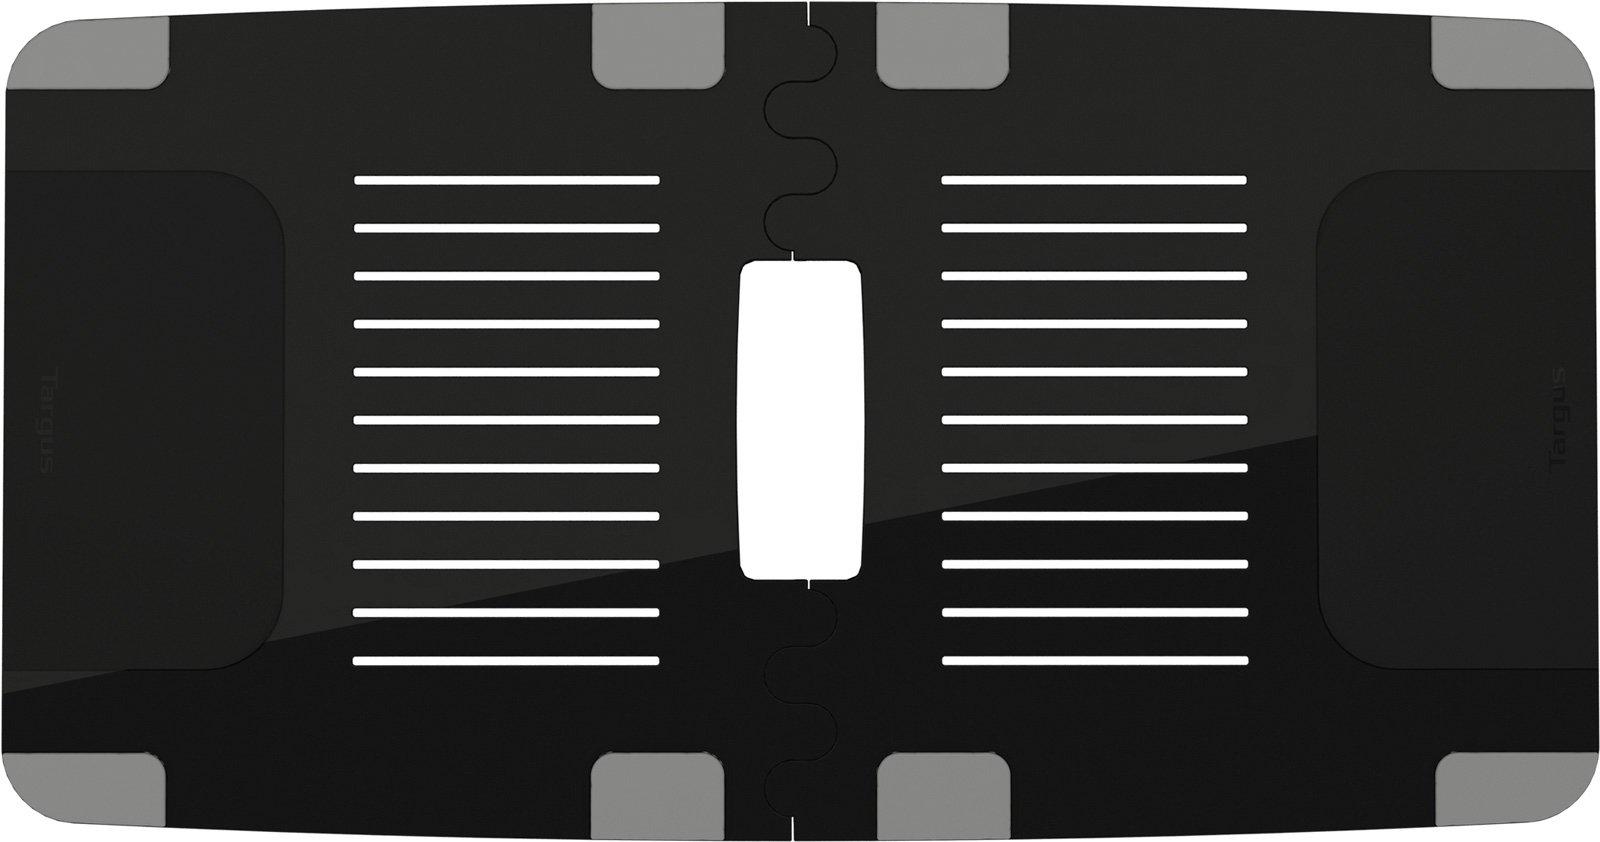 Targus Compact Laptop Desk AWE56US-Black with Gray by Targus (Image #2)